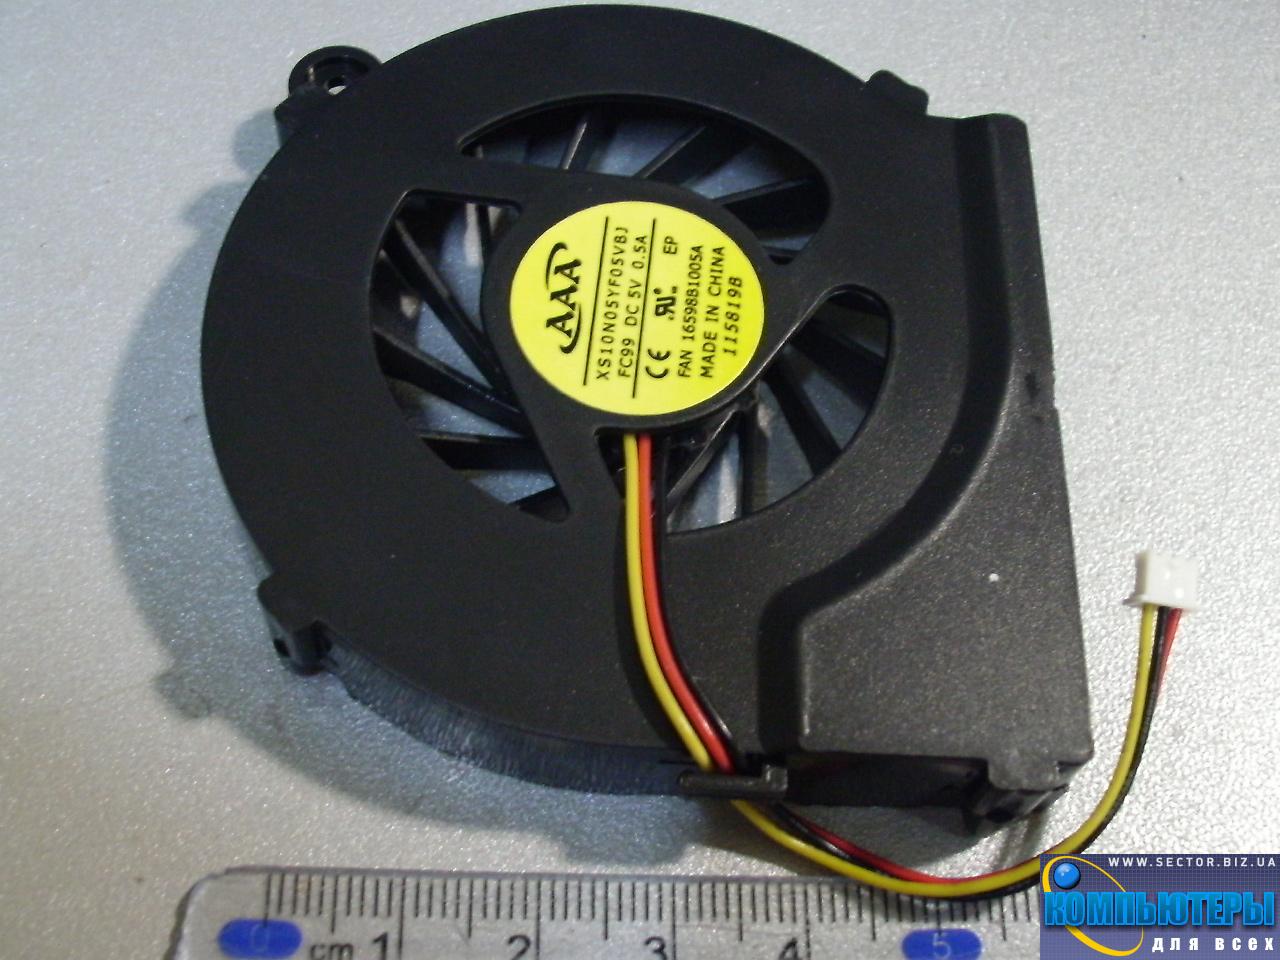 Кулер к ноутбуку HP Compaq CQ42 G42 G4 G6 G7 CQ56 G56 p/n: XS10N05YF05VBJ. Фото № 4.